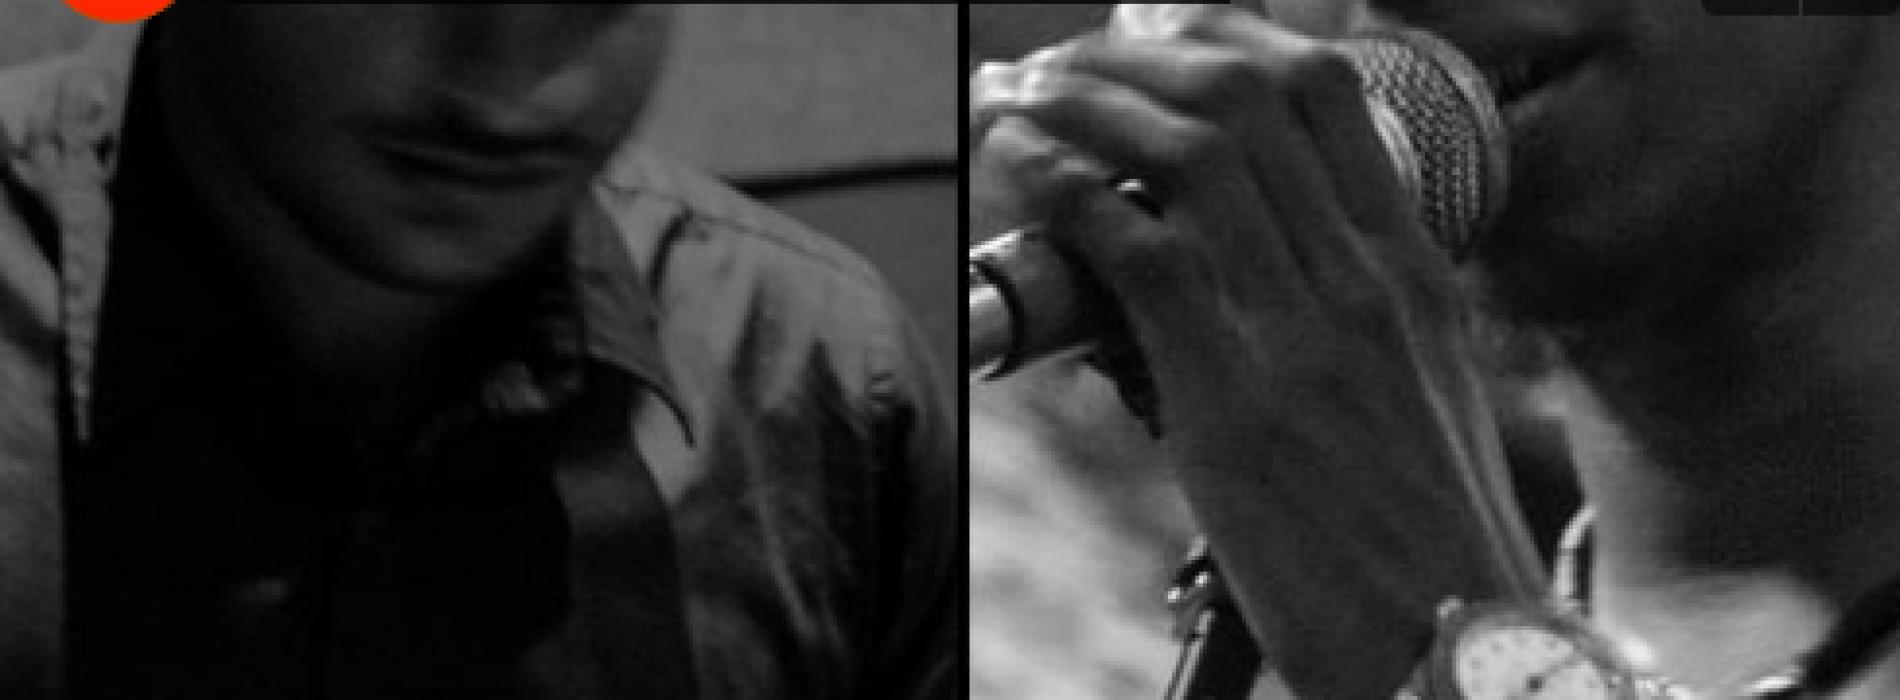 Eshantha Perera – I Am The Highway (Audioslave Cover)